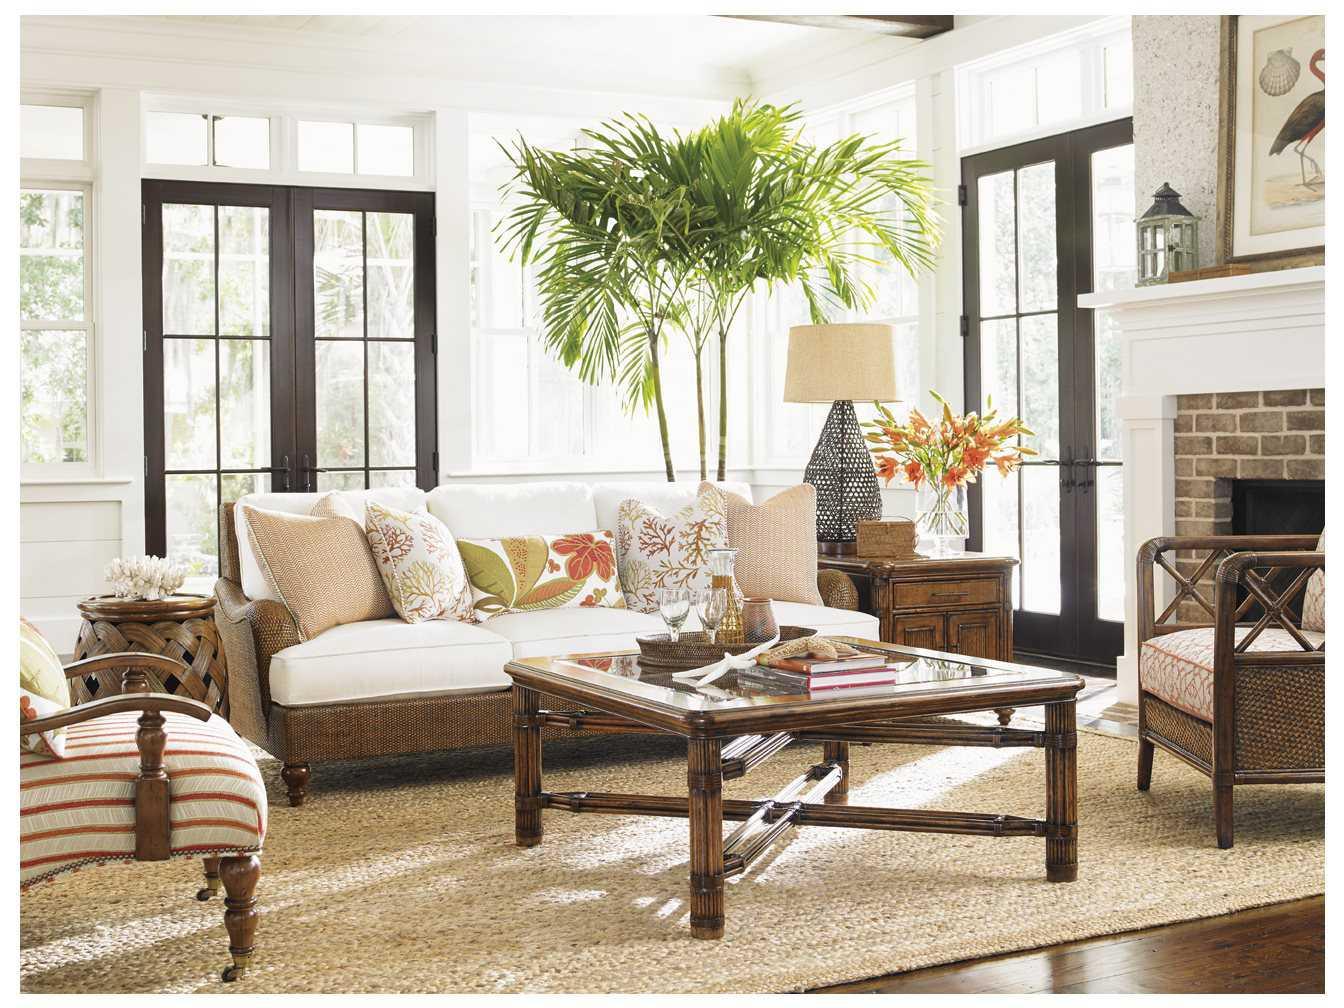 Tommy Bahama Bali Hai Living Room Set TO177433947SET